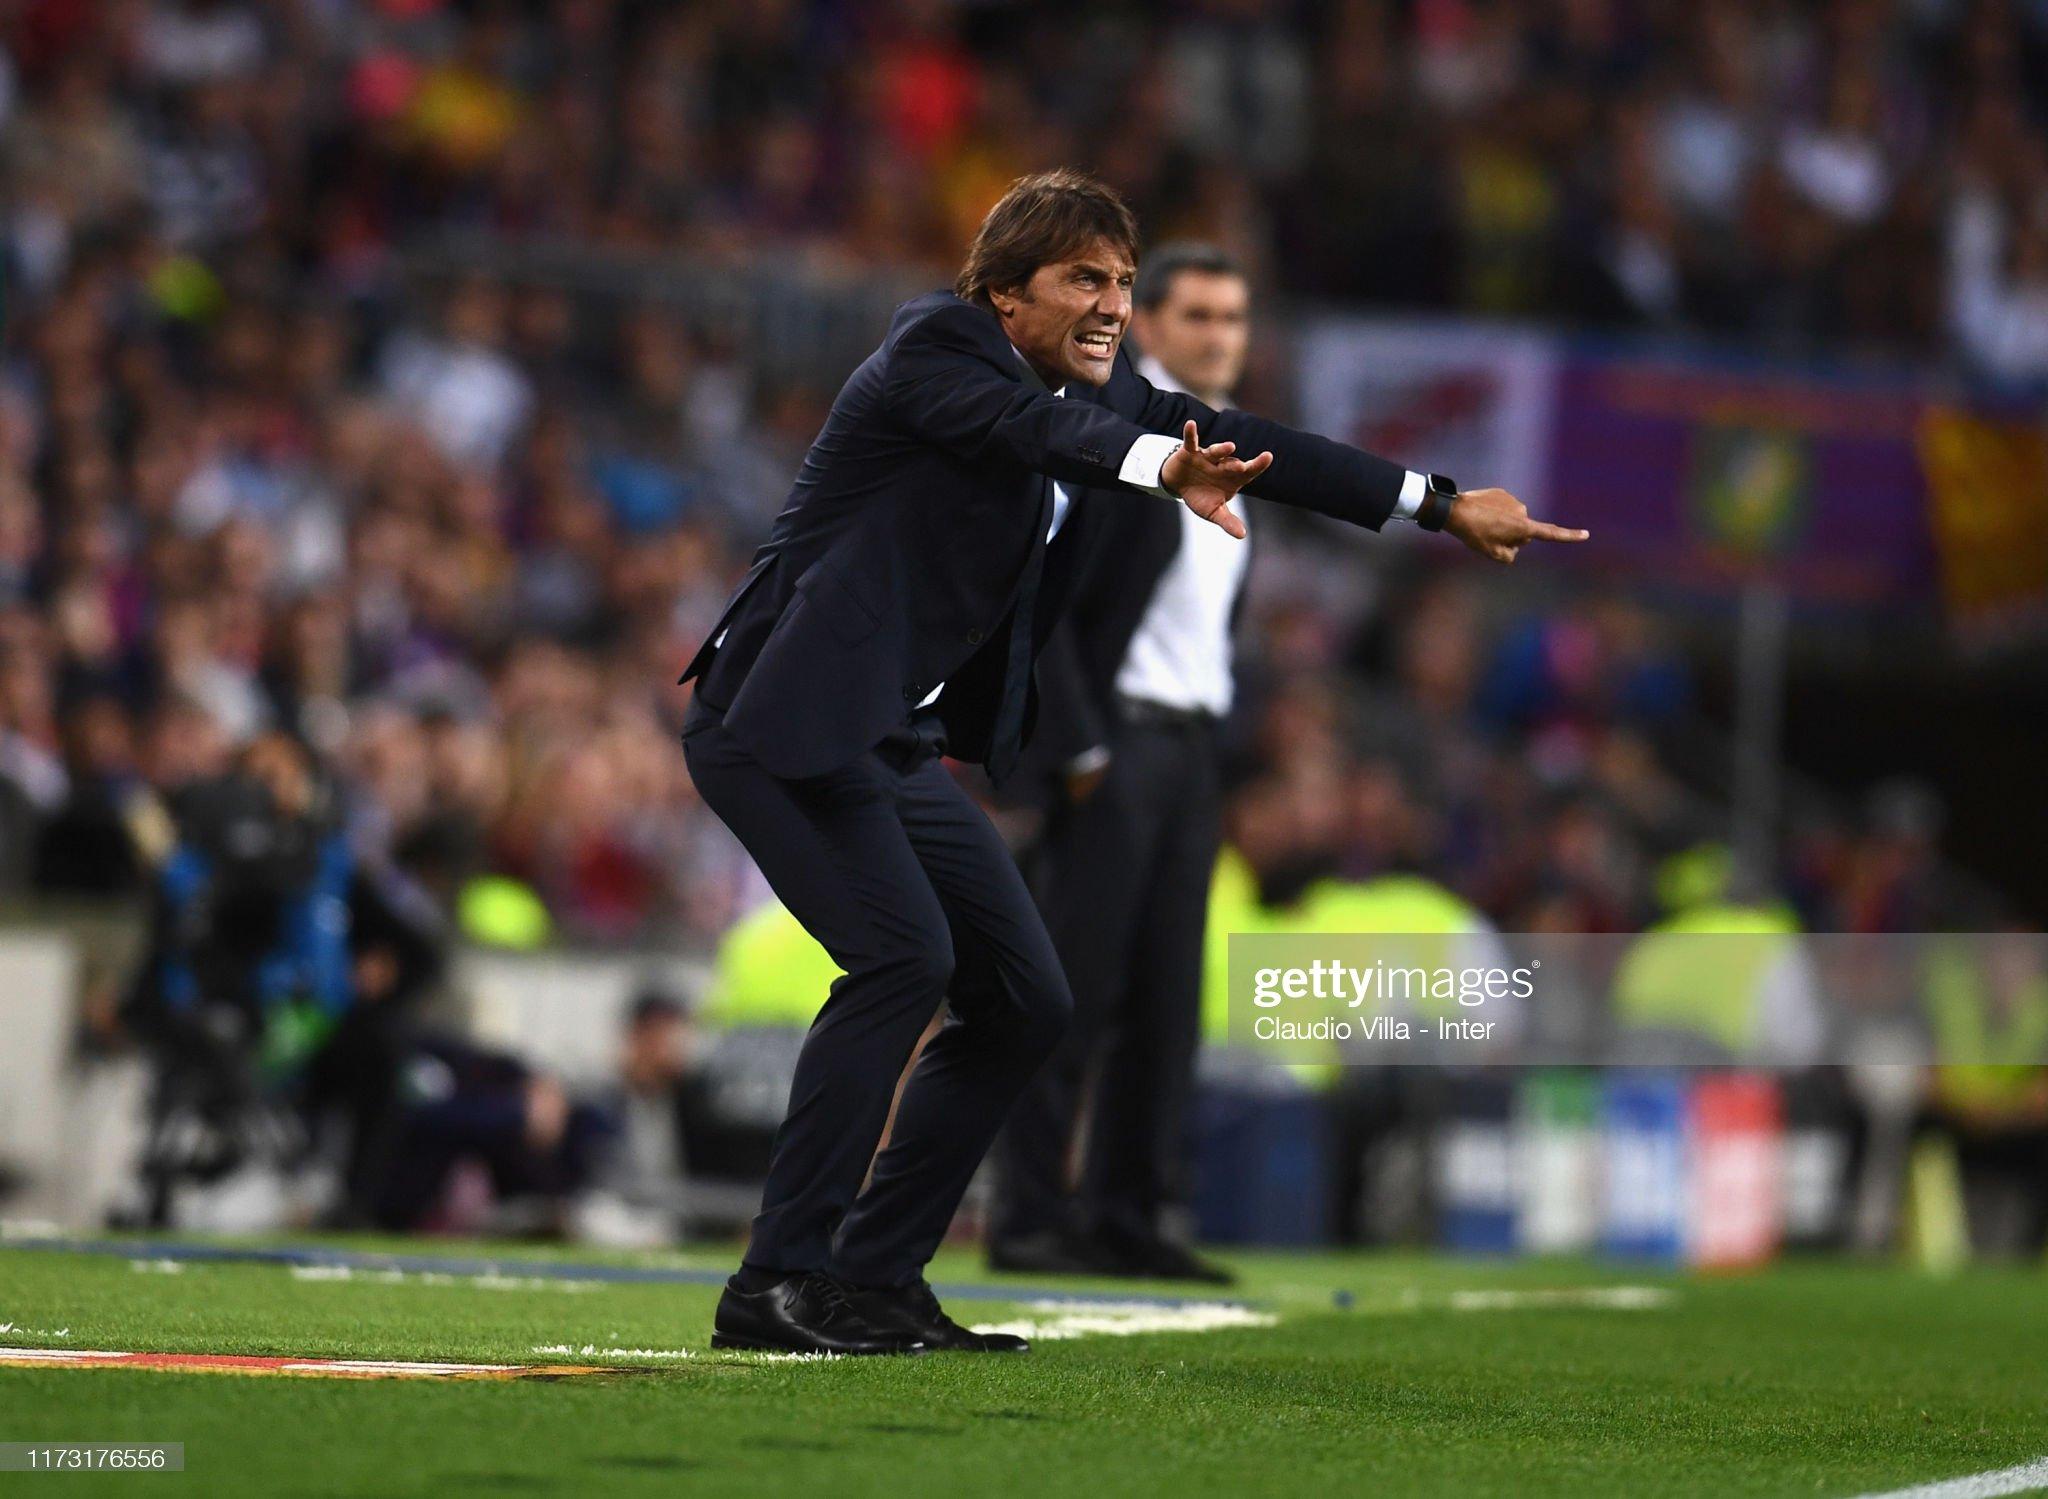 صور مباراة : برشلونة - إنتر 2-1 ( 02-10-2019 )  Head-coach-fc-internazionale-antonio-conte-reacts-during-the-uefa-picture-id1173176556?s=2048x2048